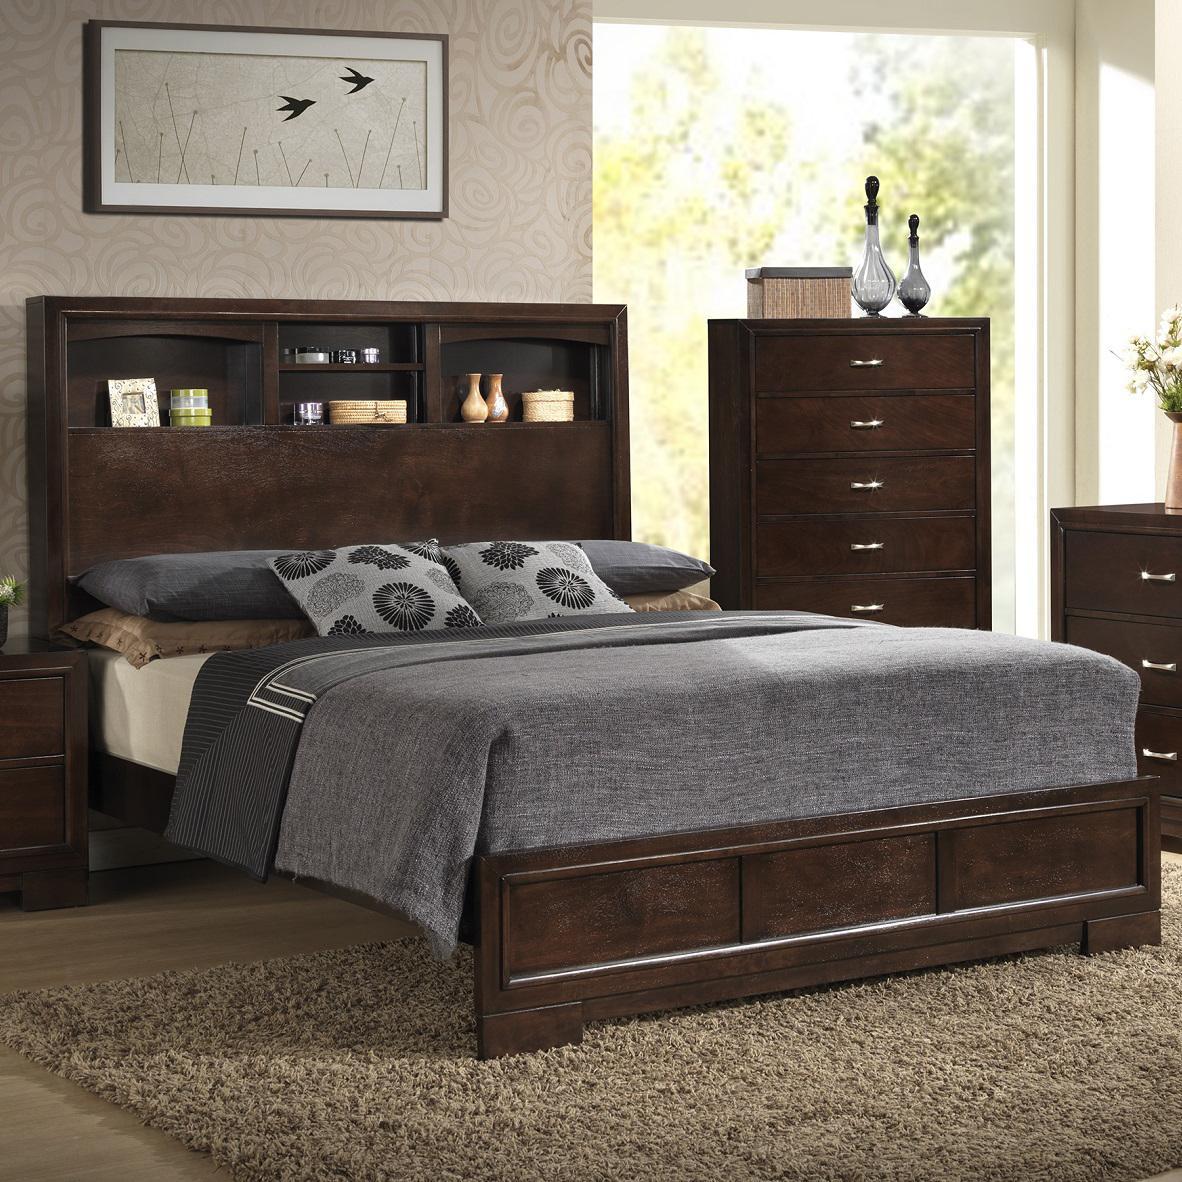 Bookie Queen Bookcase Bed